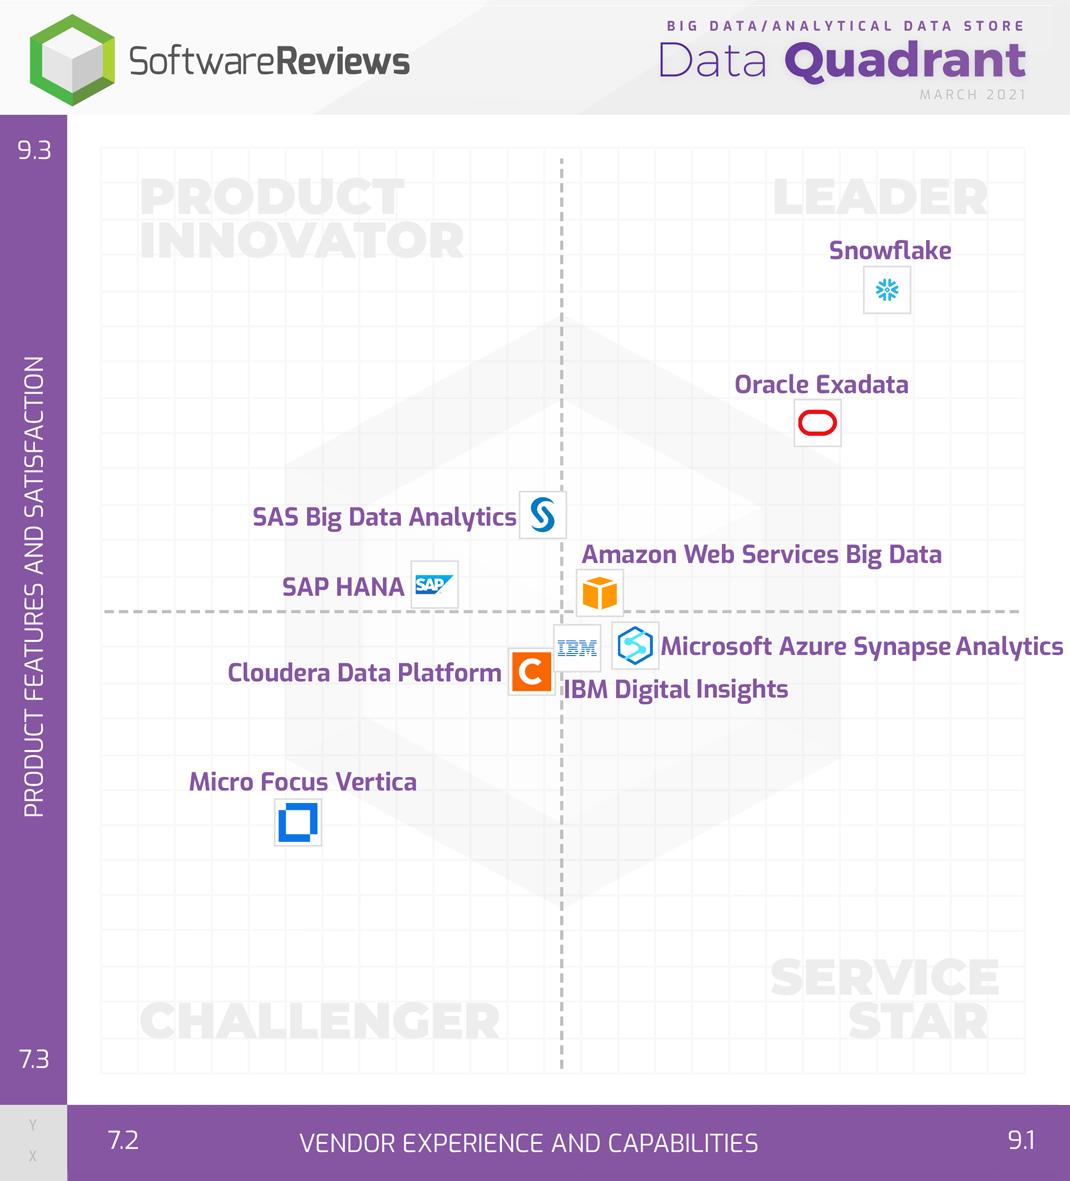 Big Data/Analytical Data Store Data Quadrant